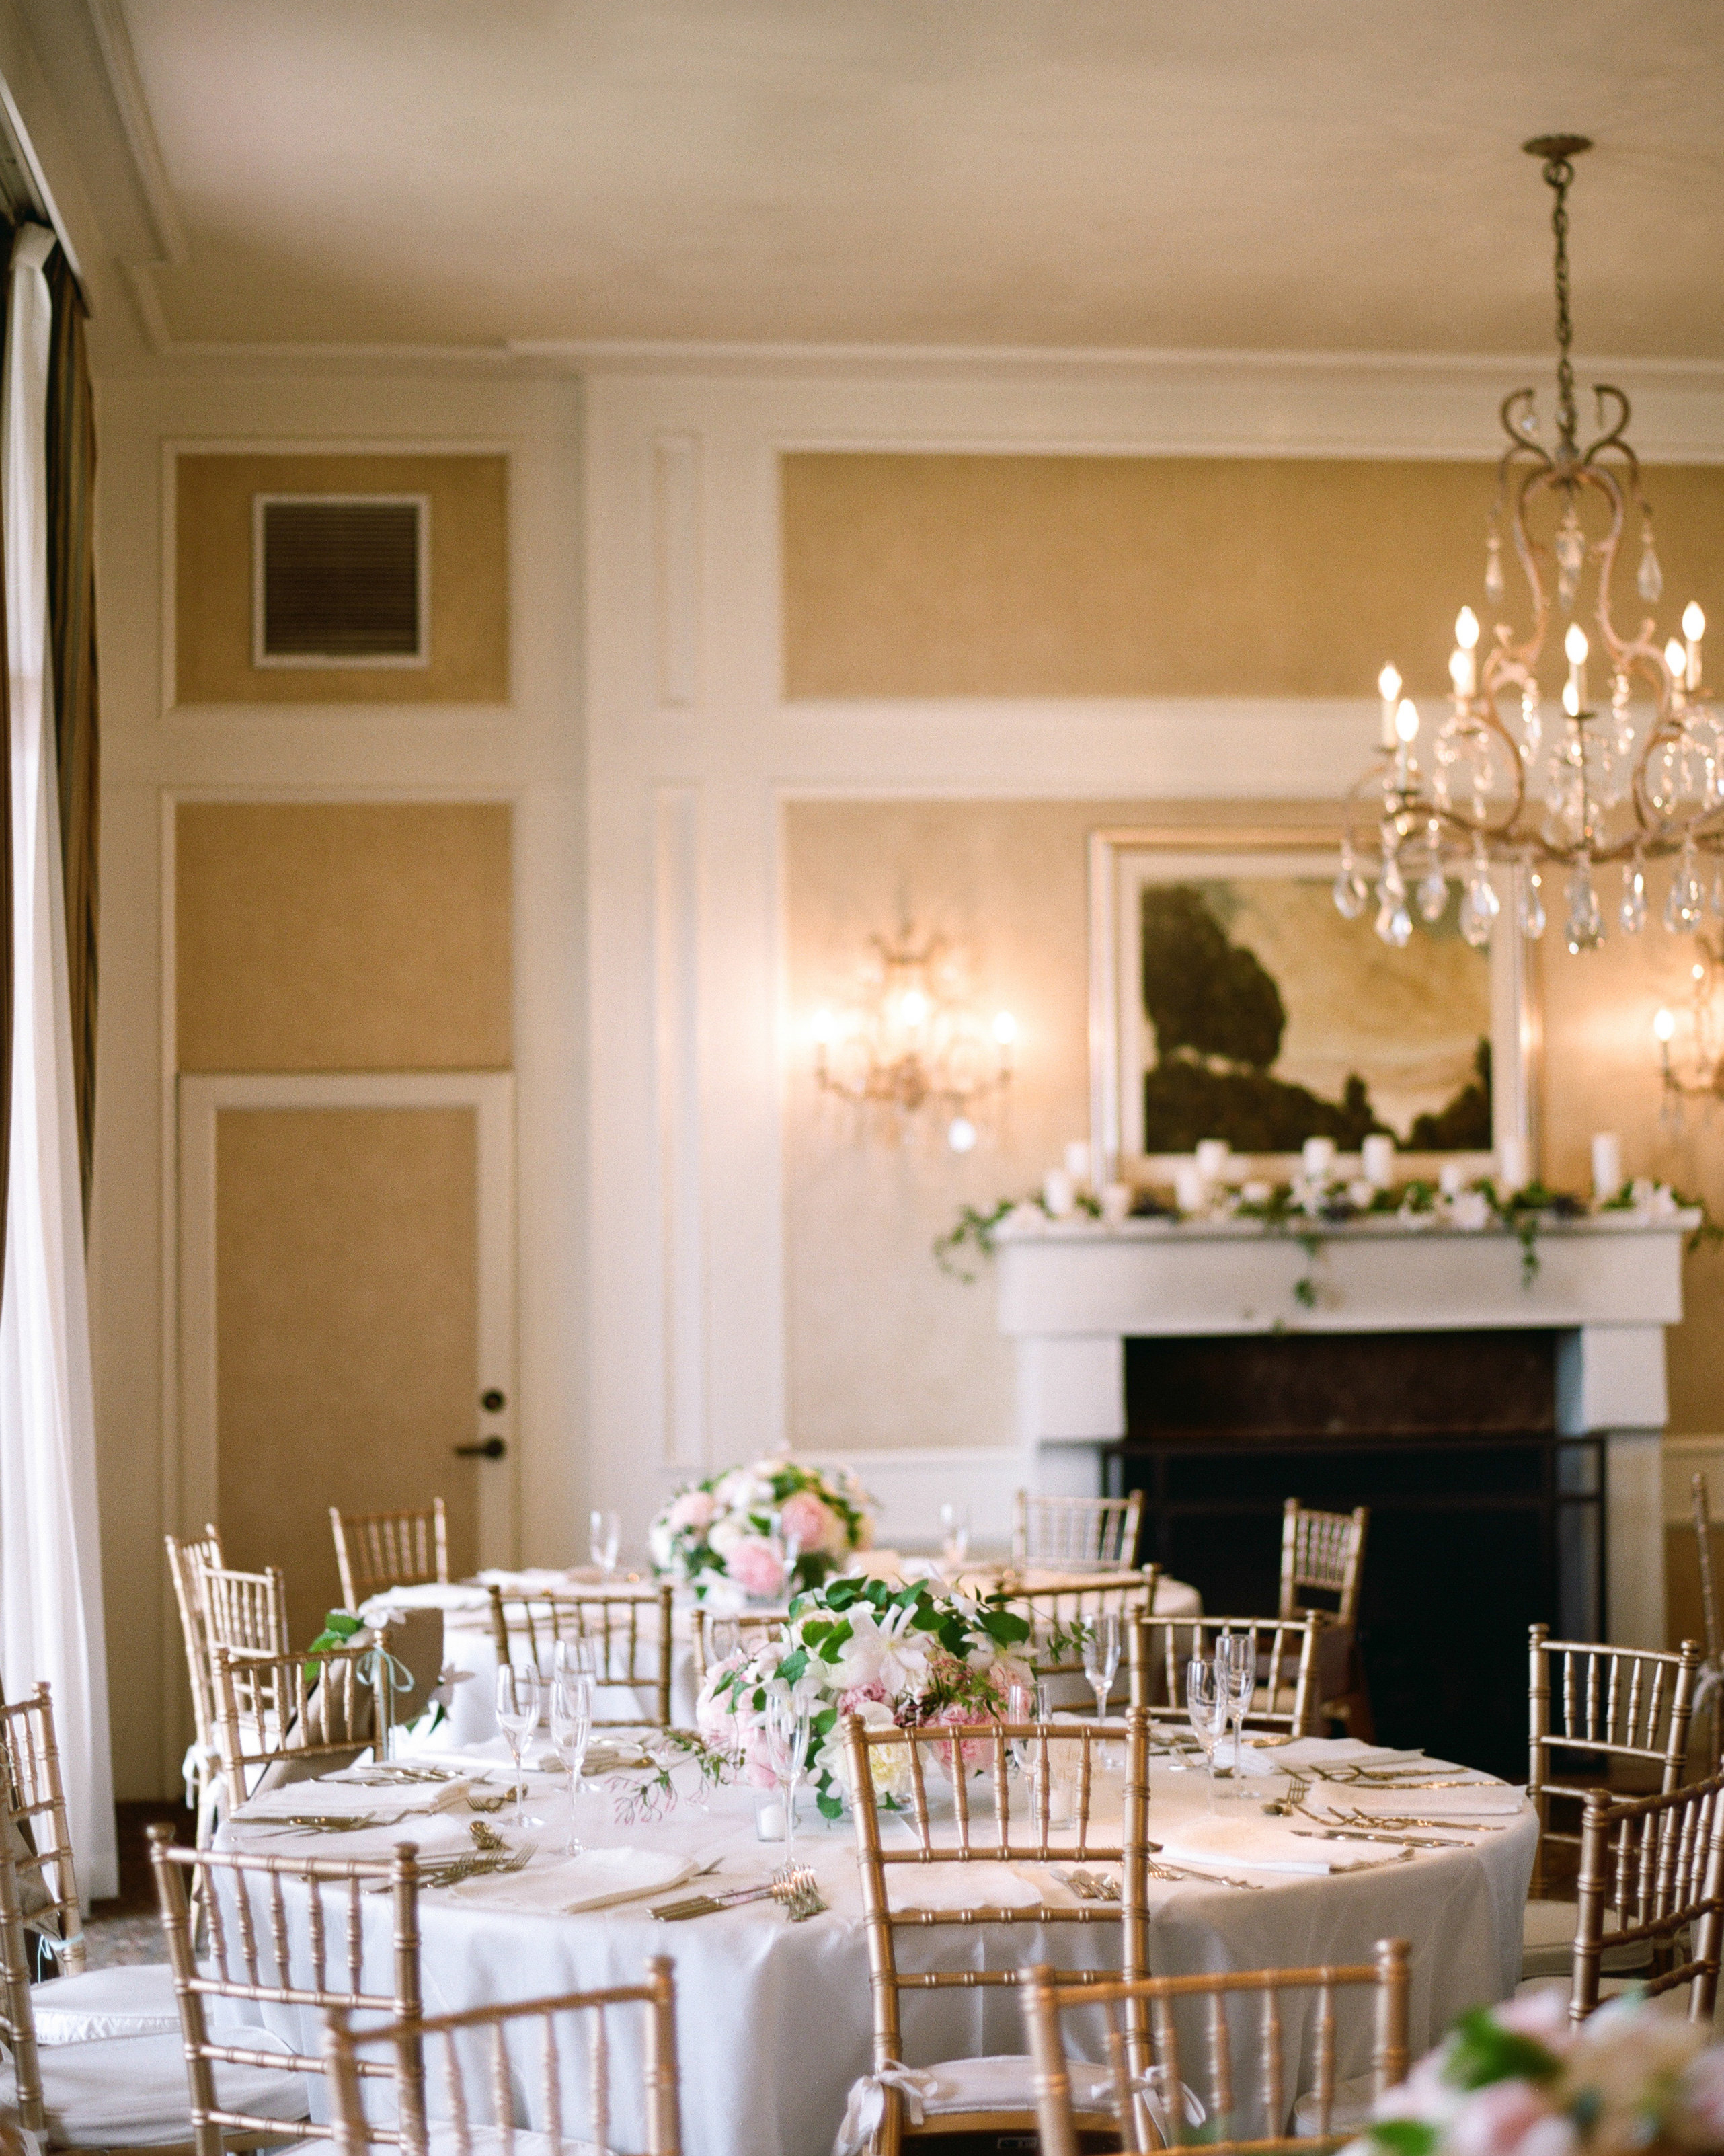 marwa-peter-wedding-reception-0414.jpg